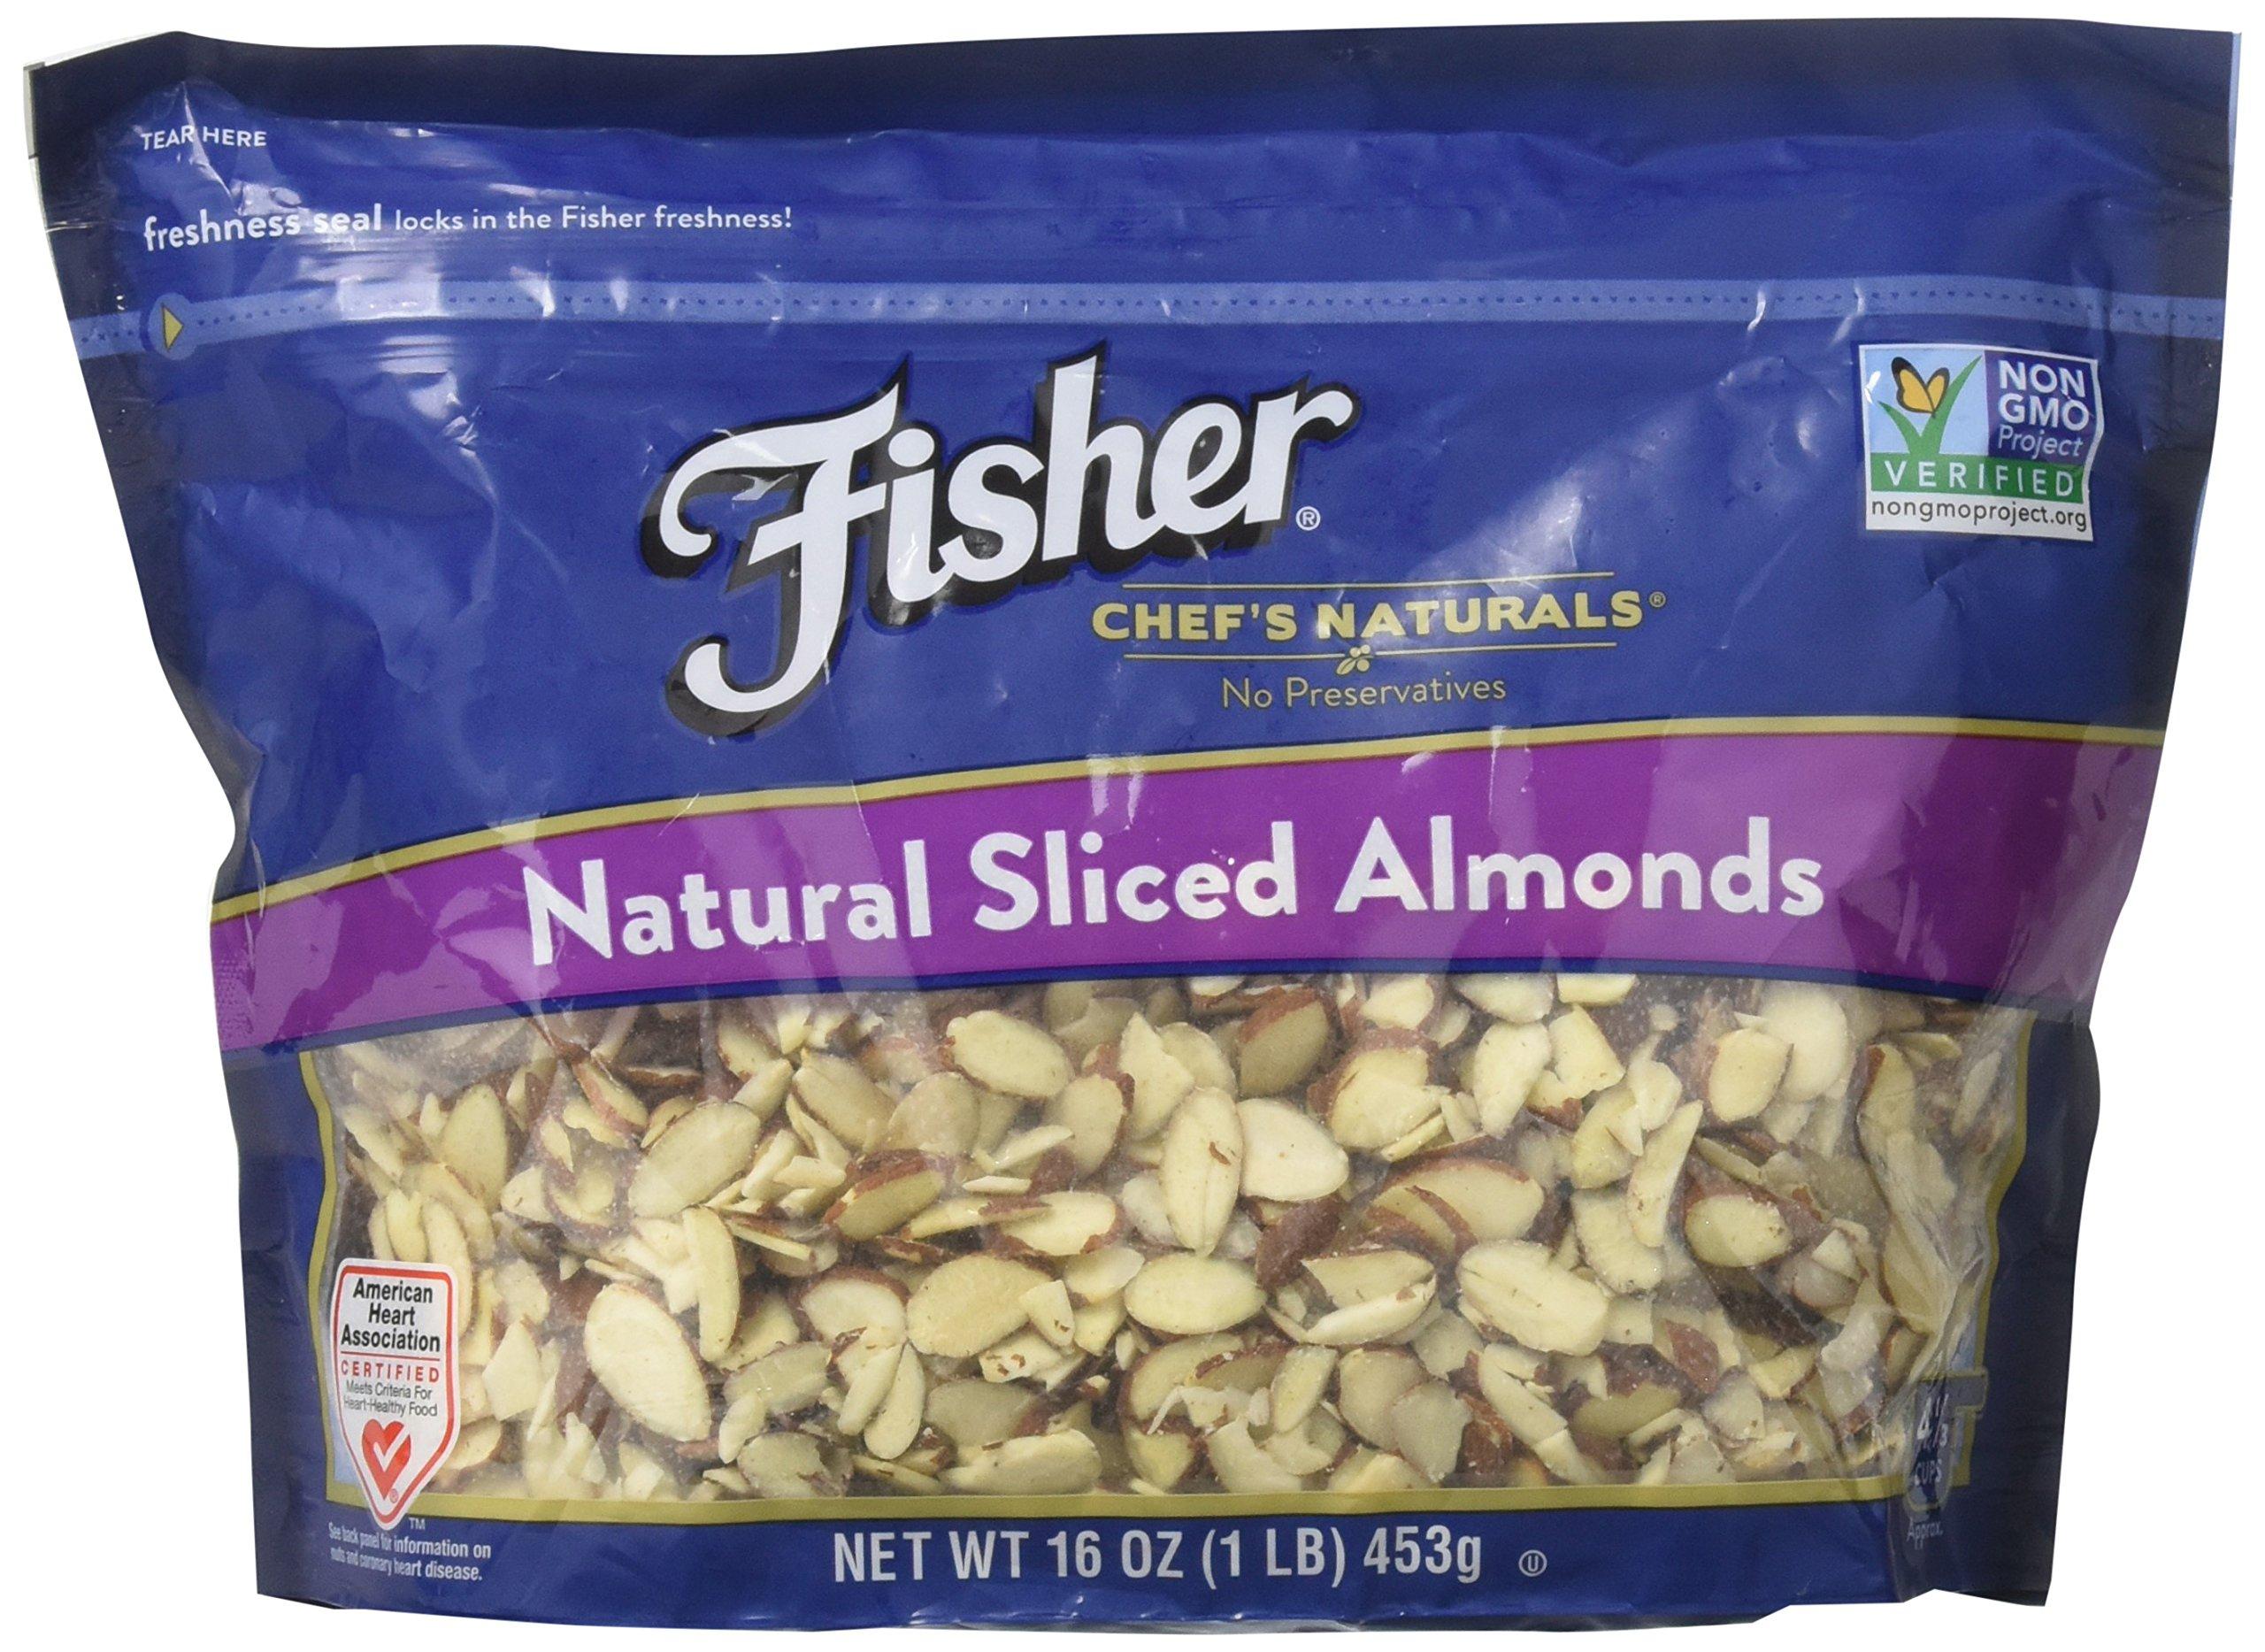 Fisher Chef's Naturals Natural Sliced Almonds 16 Oz. (1 Lb.)